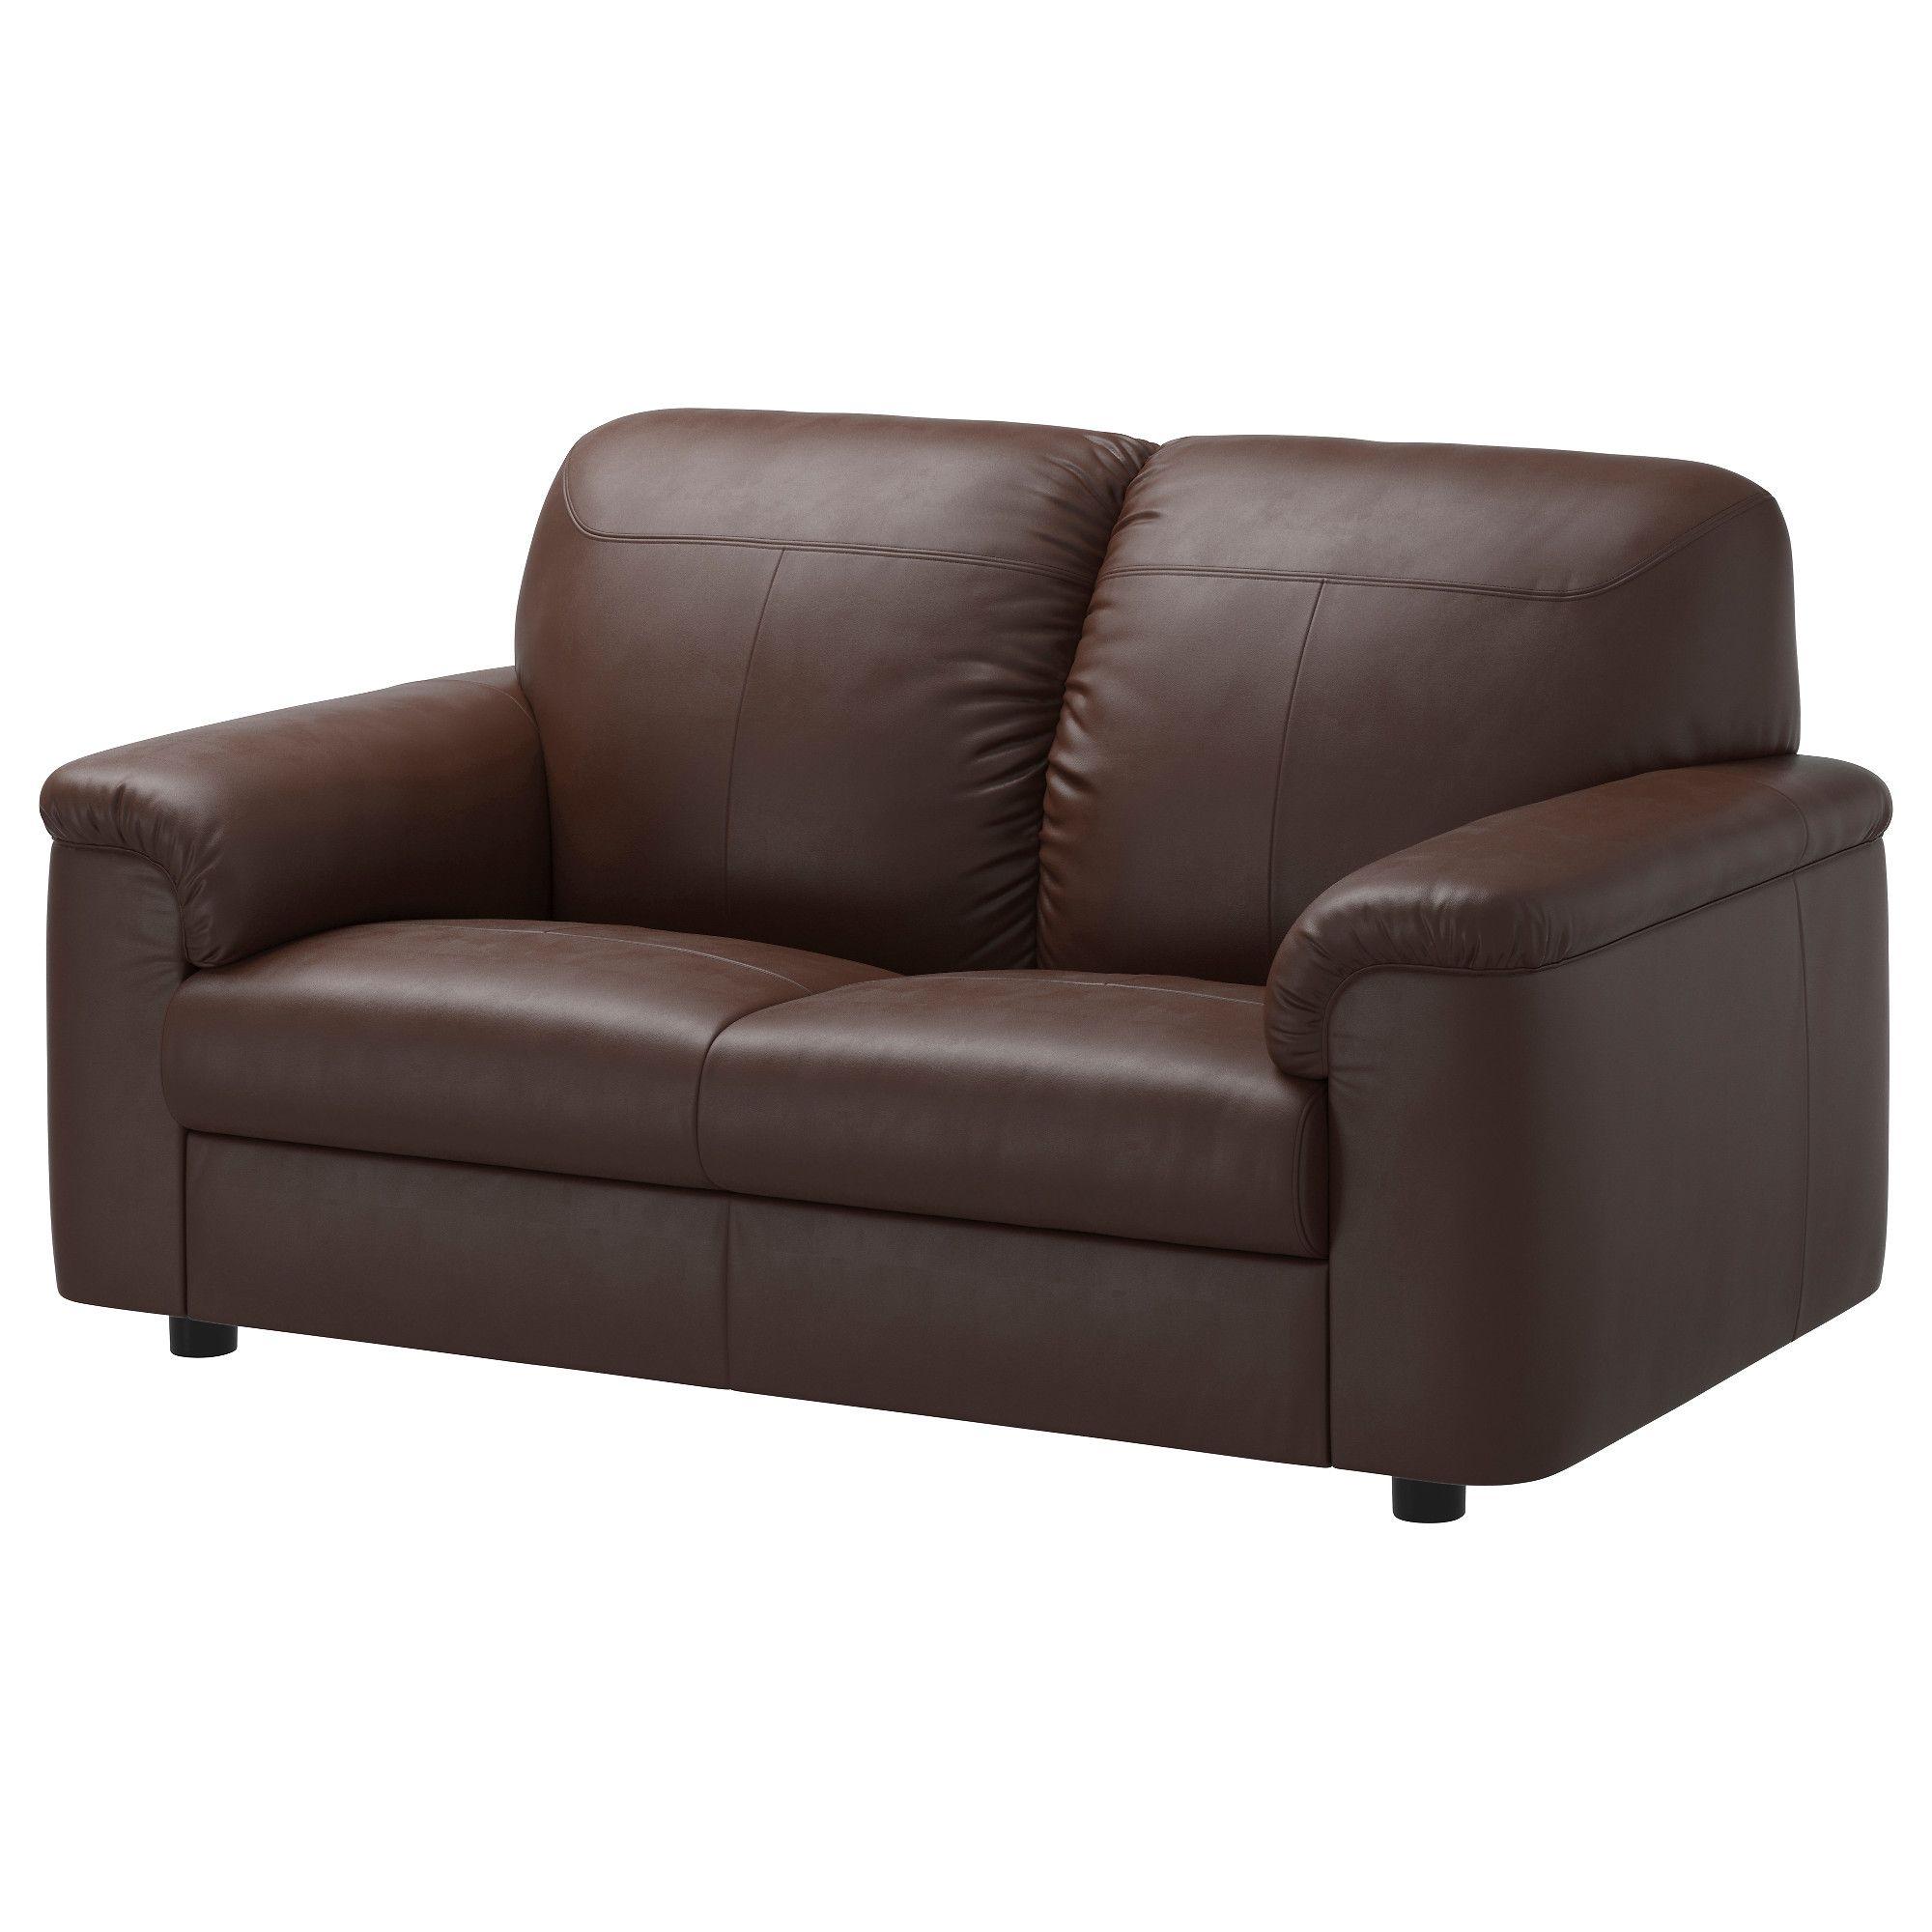 Ikea Timsfors Two Seat Sofa Mjuk Kimstad Dark Brown